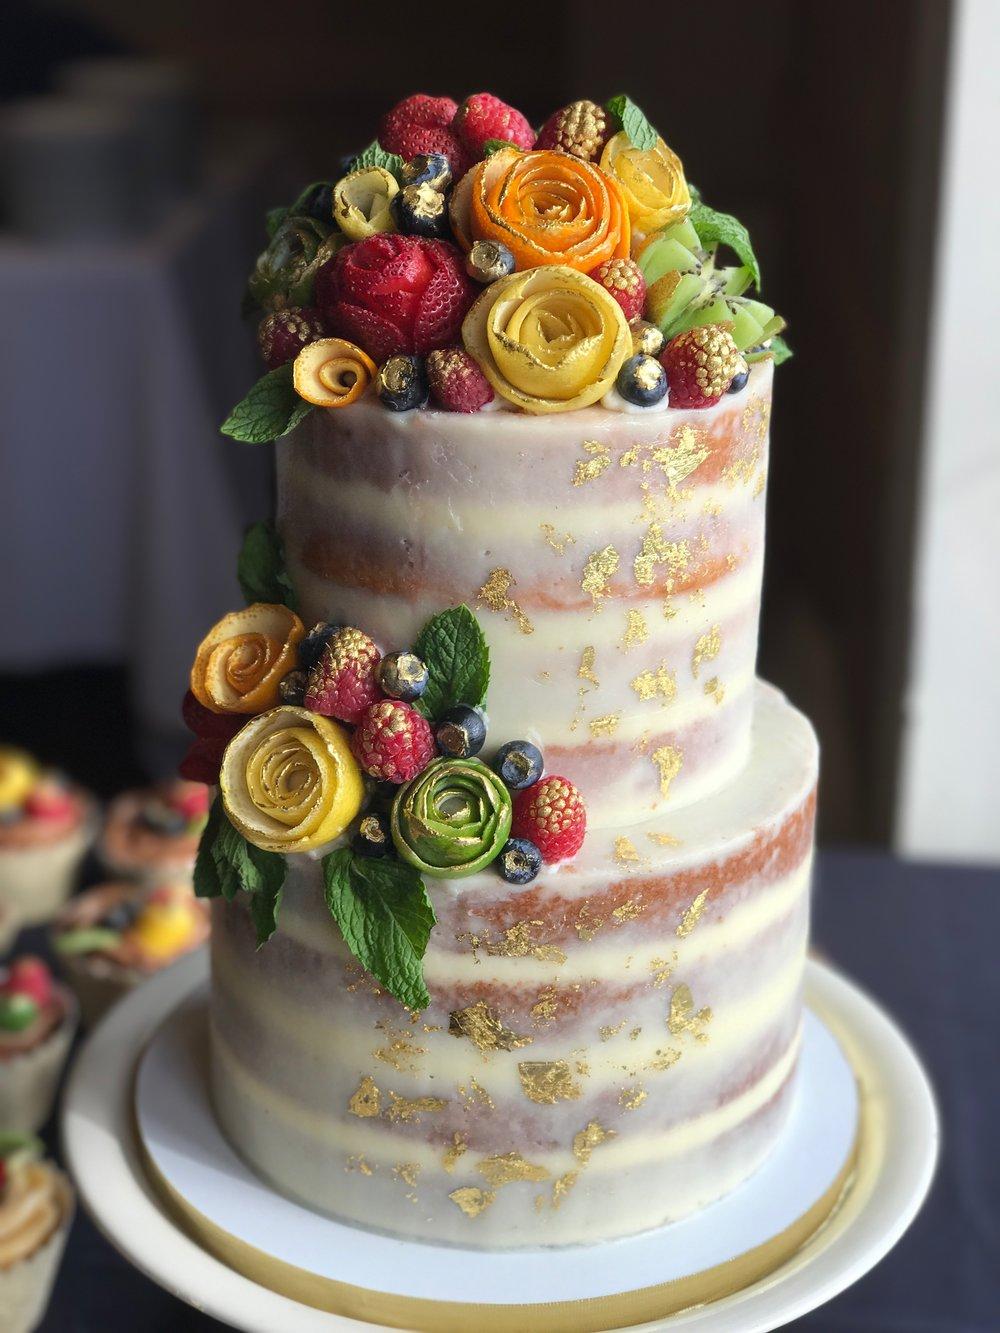 Semi-Naked cake shown with signature fruit flowers. ** Fruit flowers or fresh fresh flowers is an add on**